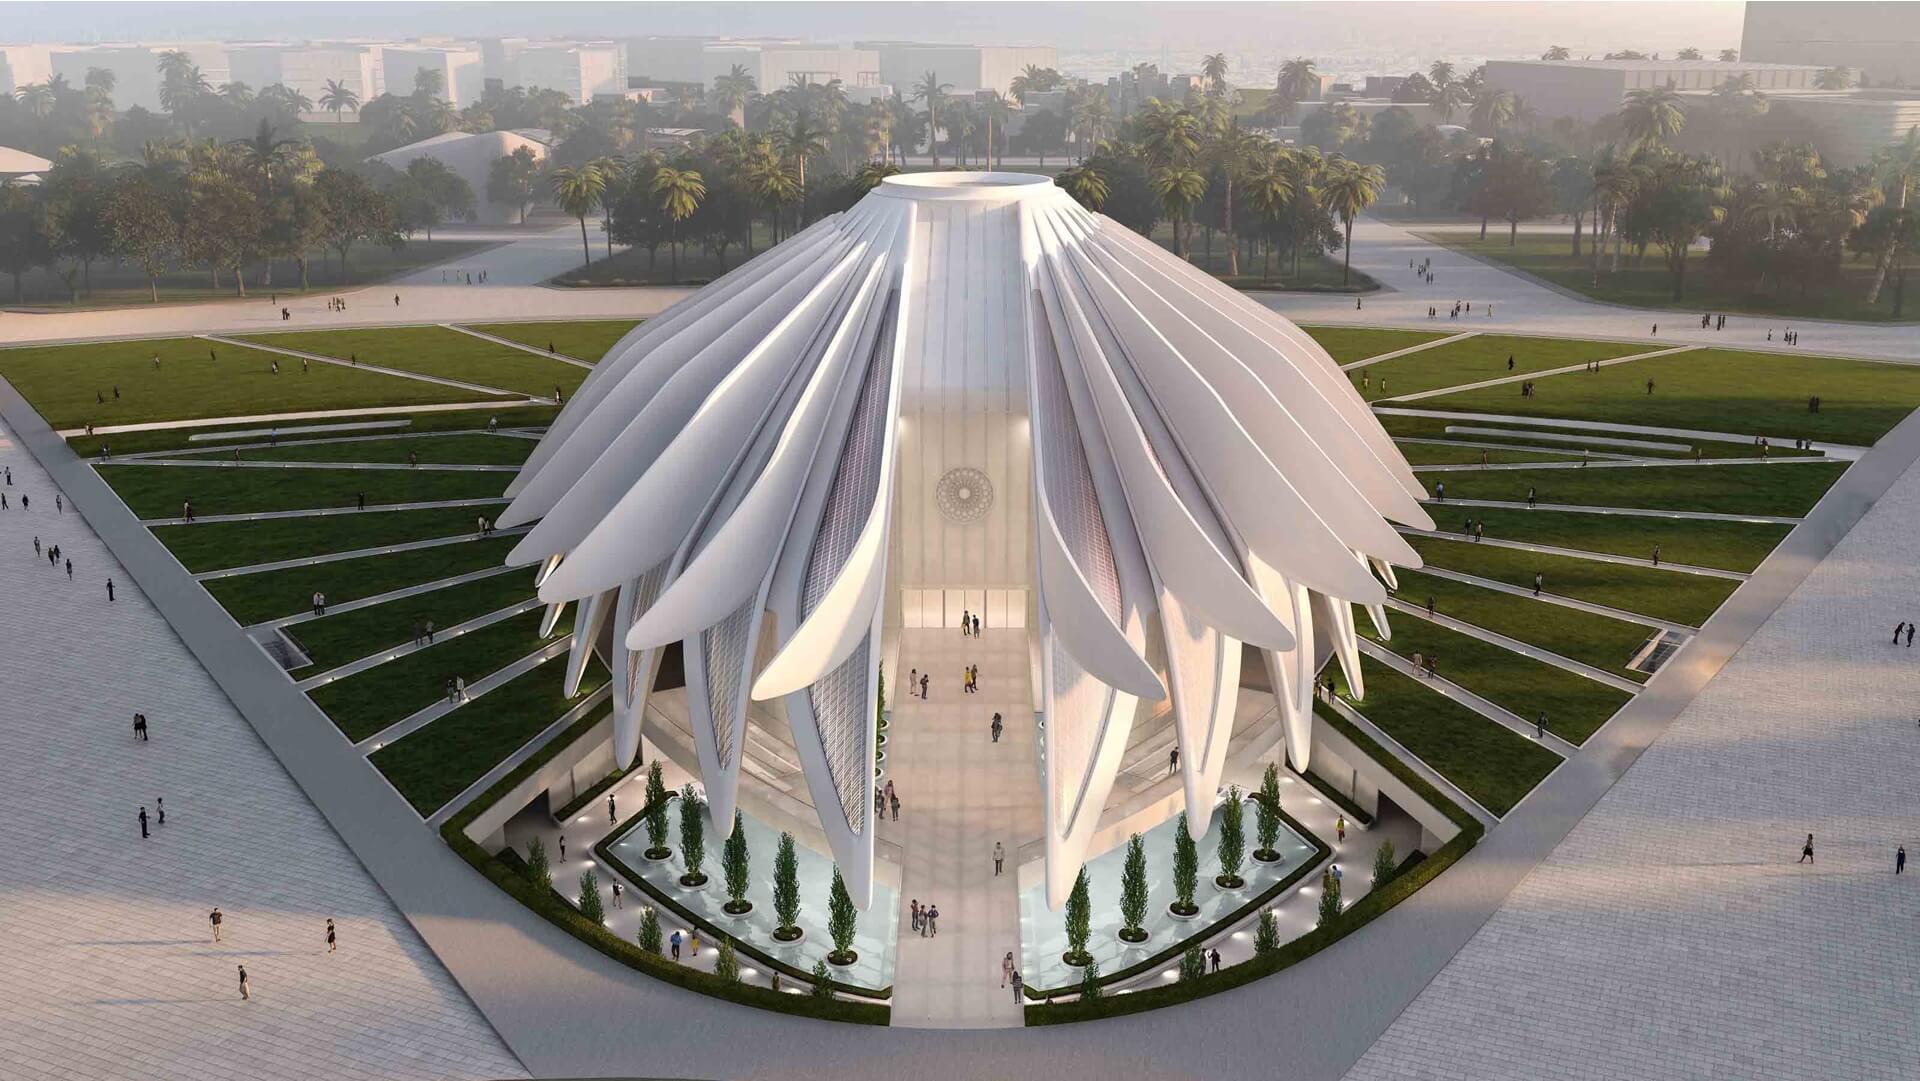 DEWA to organize WETEX, Dubai Solar Show at Expo 2020 Dubai